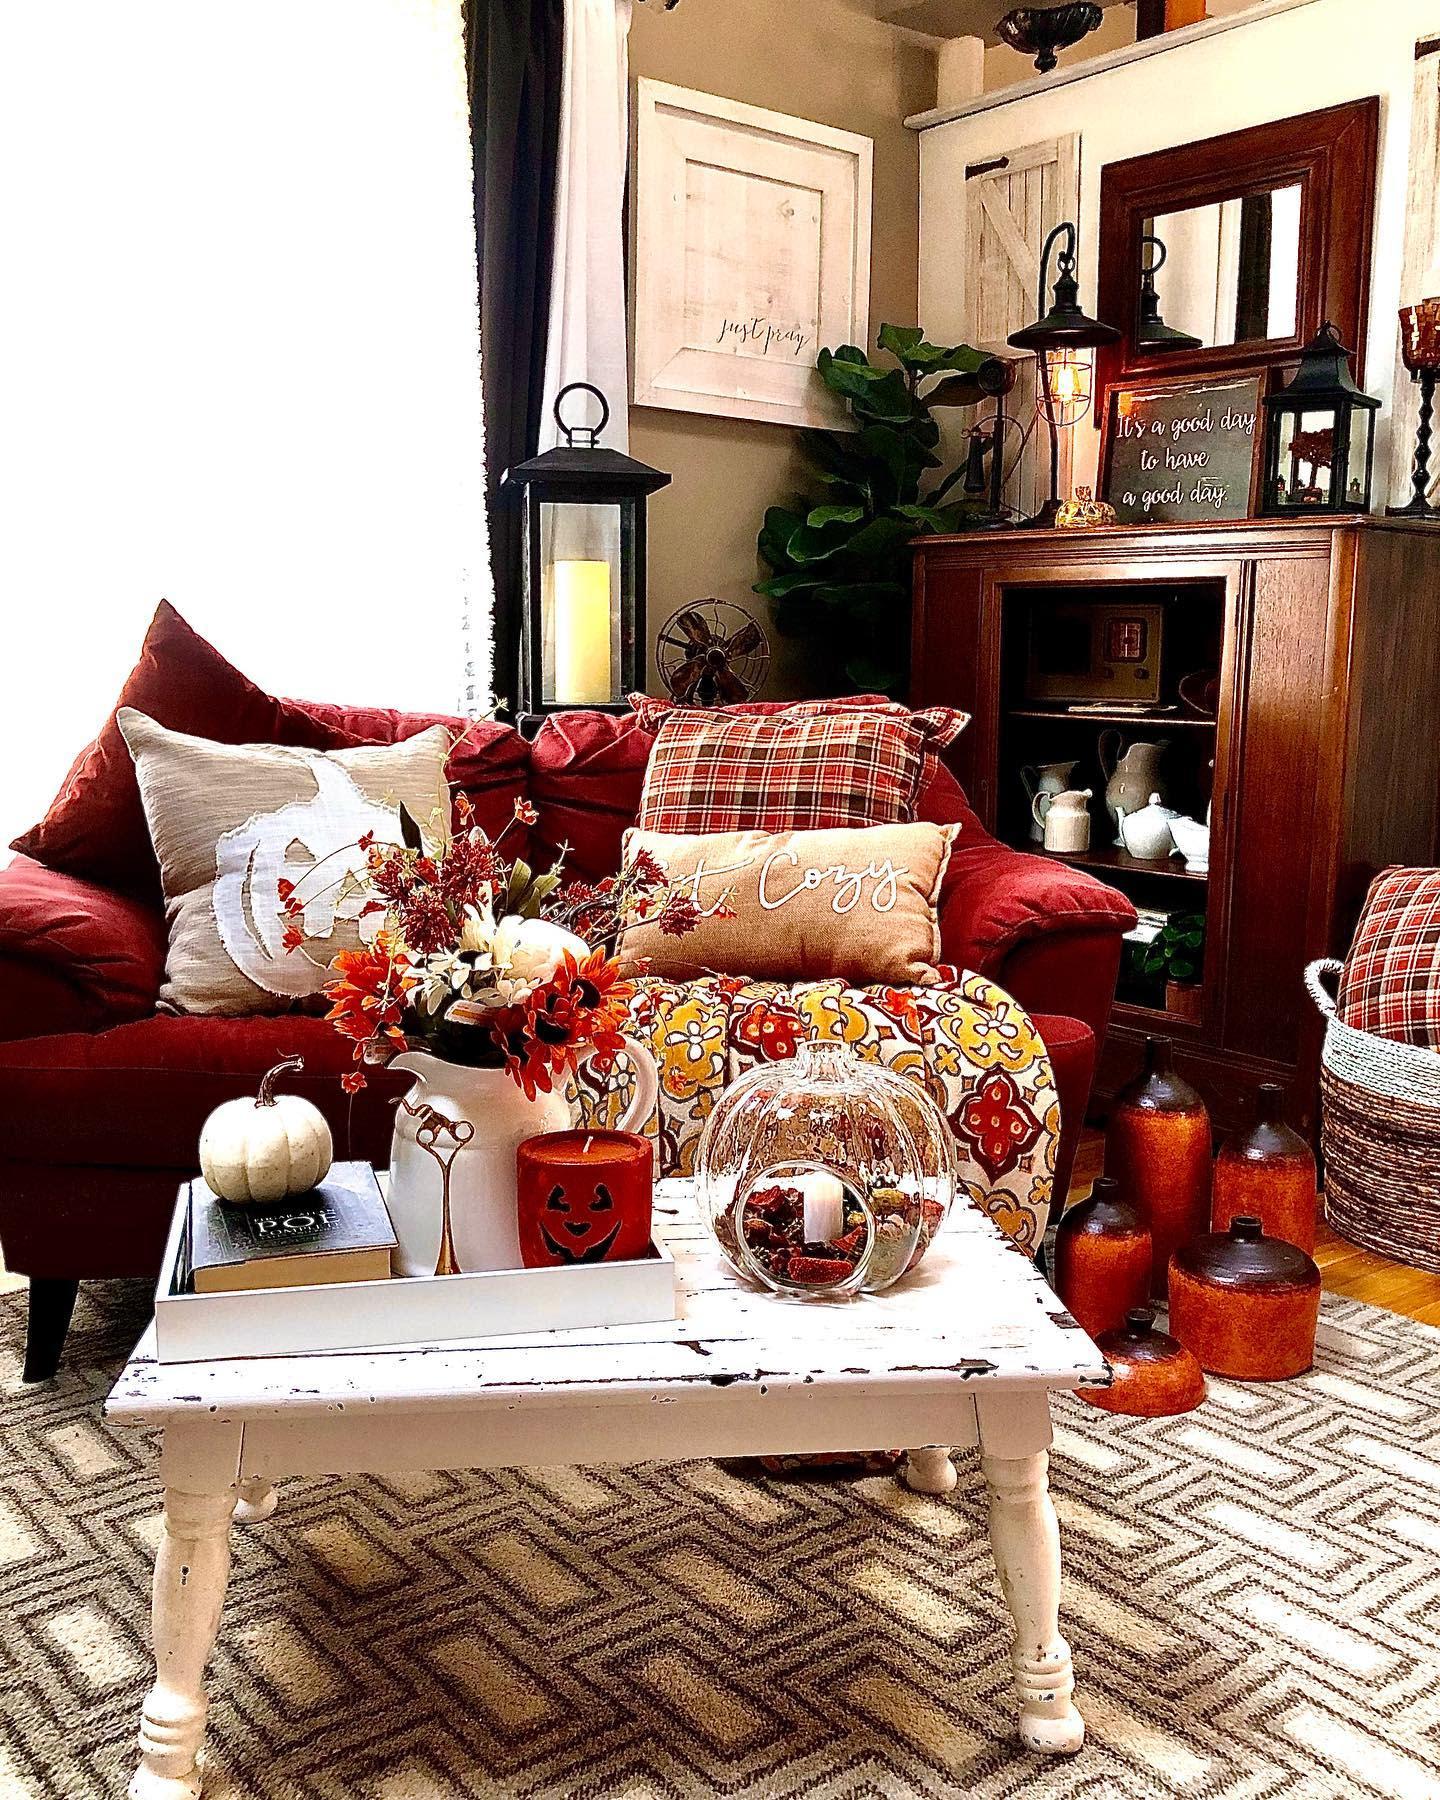 living-area-fall-decorating-ideas-casadecor_by_yolie